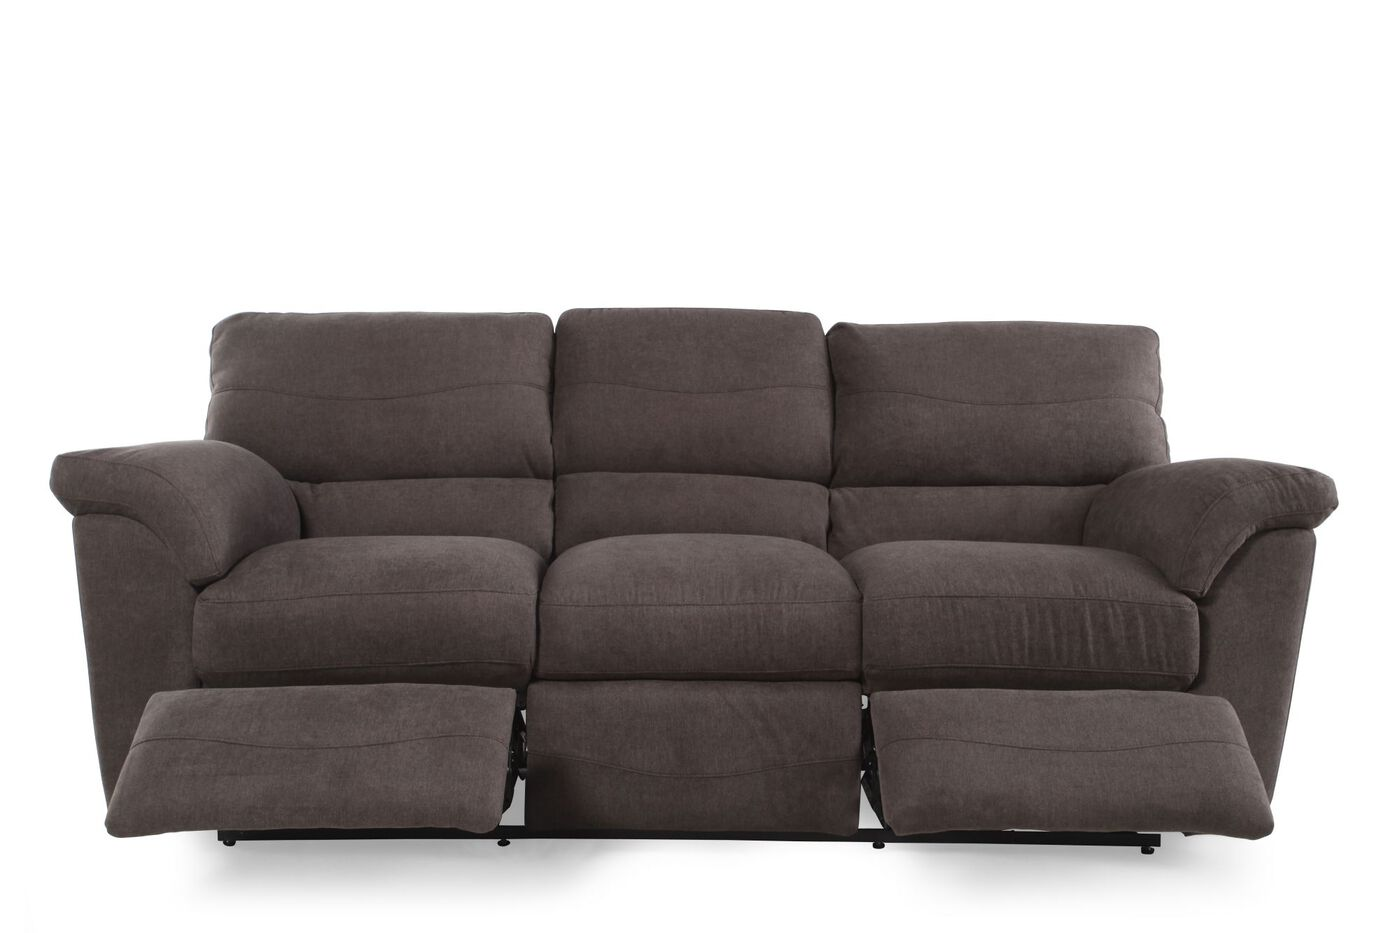 lazy boy reese sofa lazy boy leather reclining sofa. Black Bedroom Furniture Sets. Home Design Ideas